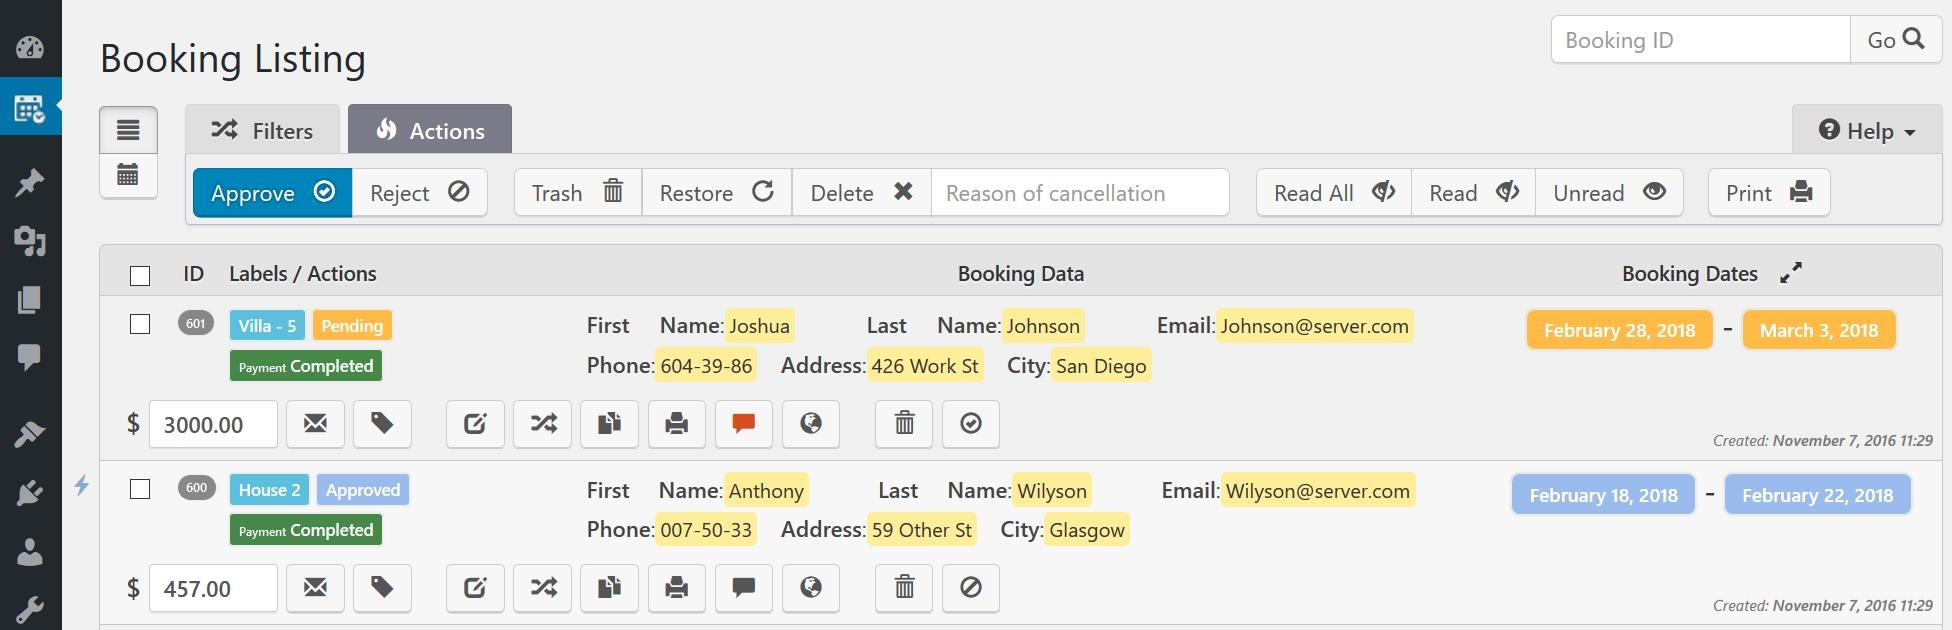 Booking Calendar - WordPress Plugin, Receive Bookings Easily